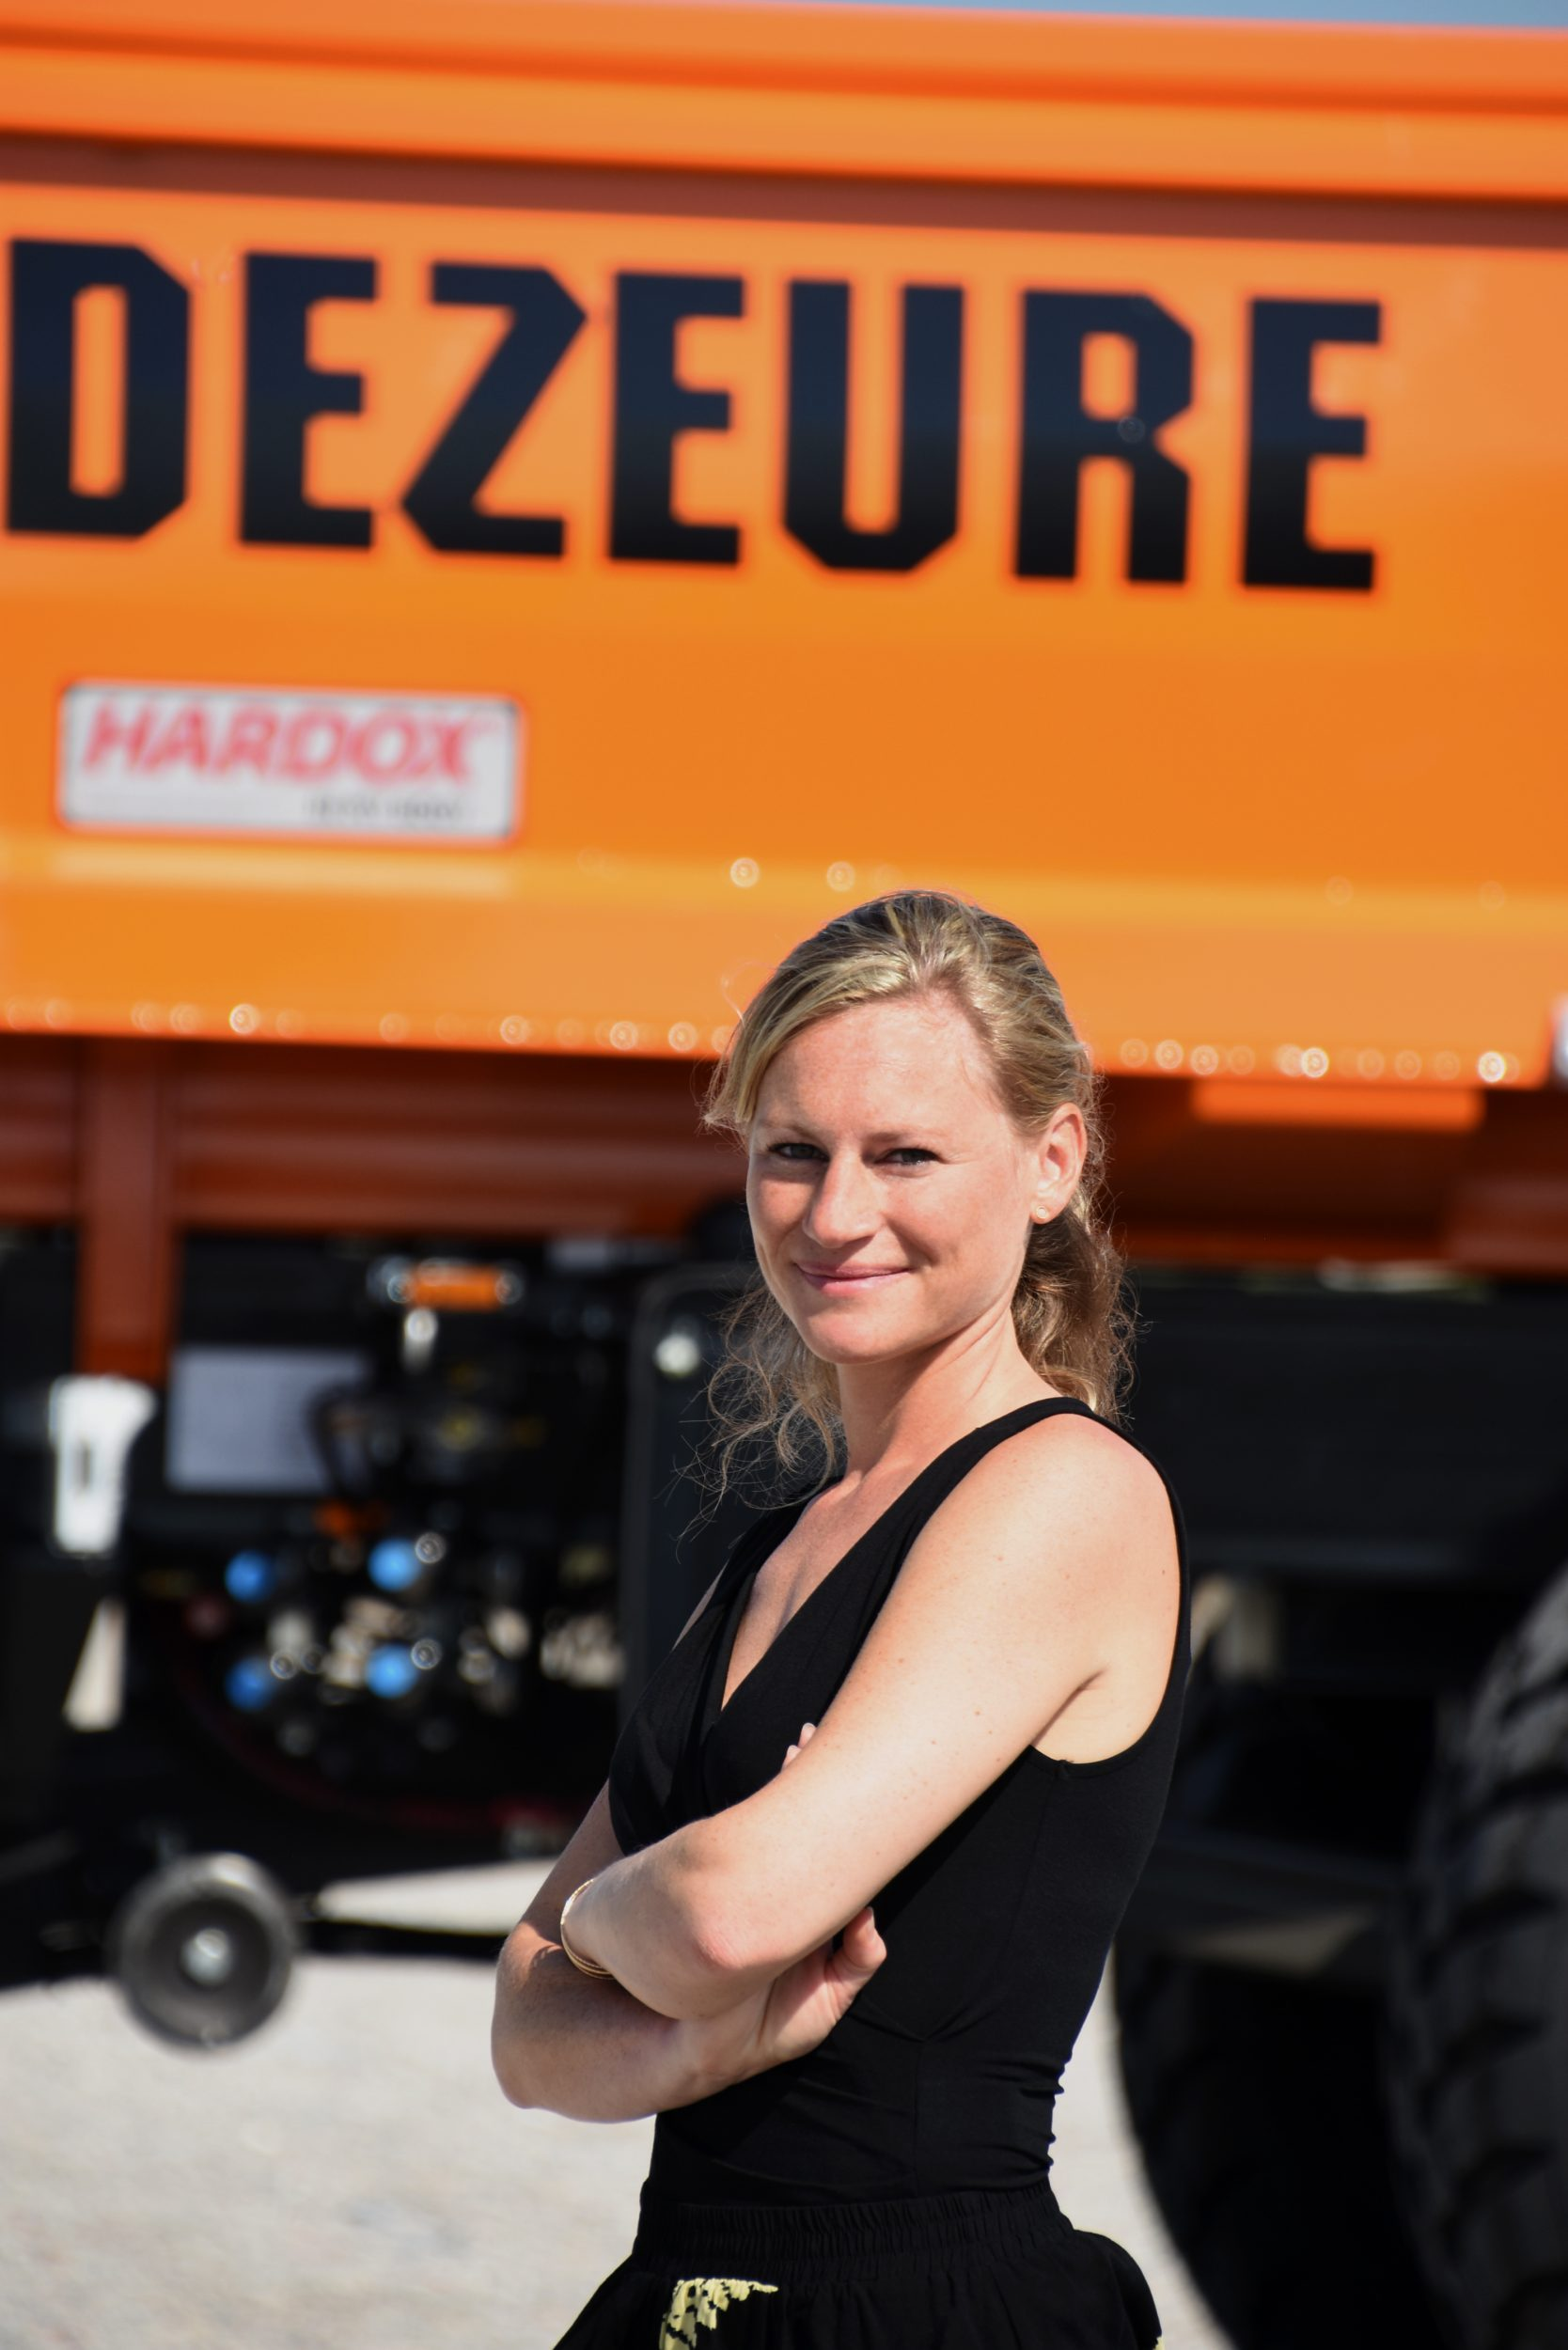 Magazine – Vrouw in de landbouw: Tine Dezeure